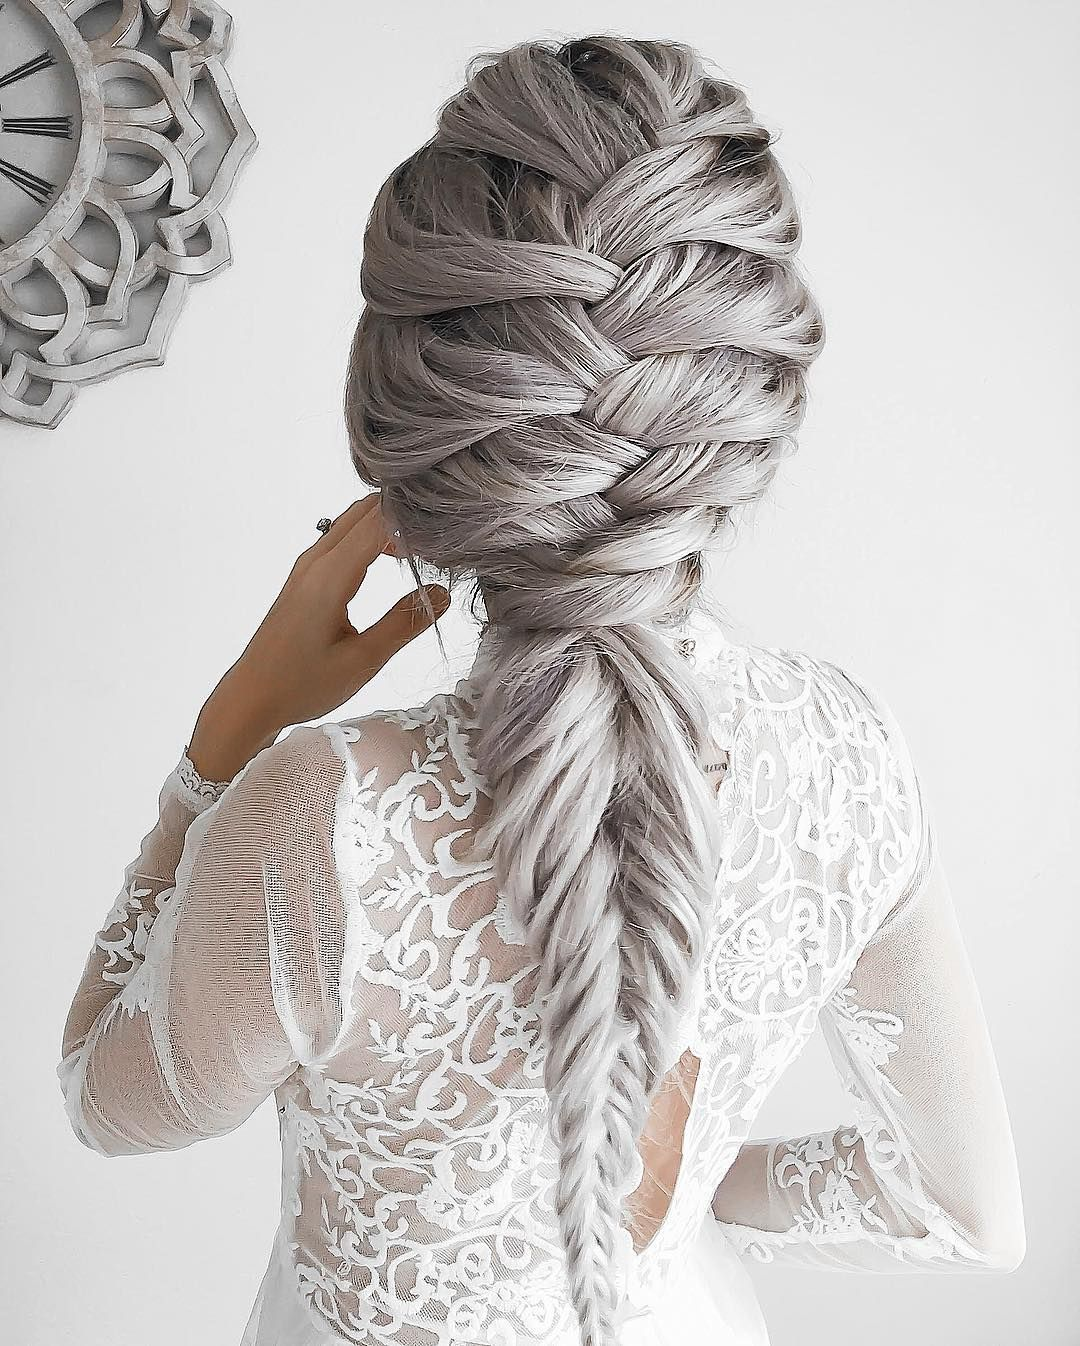 Pinterest @18Redhead   I am My hair✄   Pinterest   Hair style, Make ...